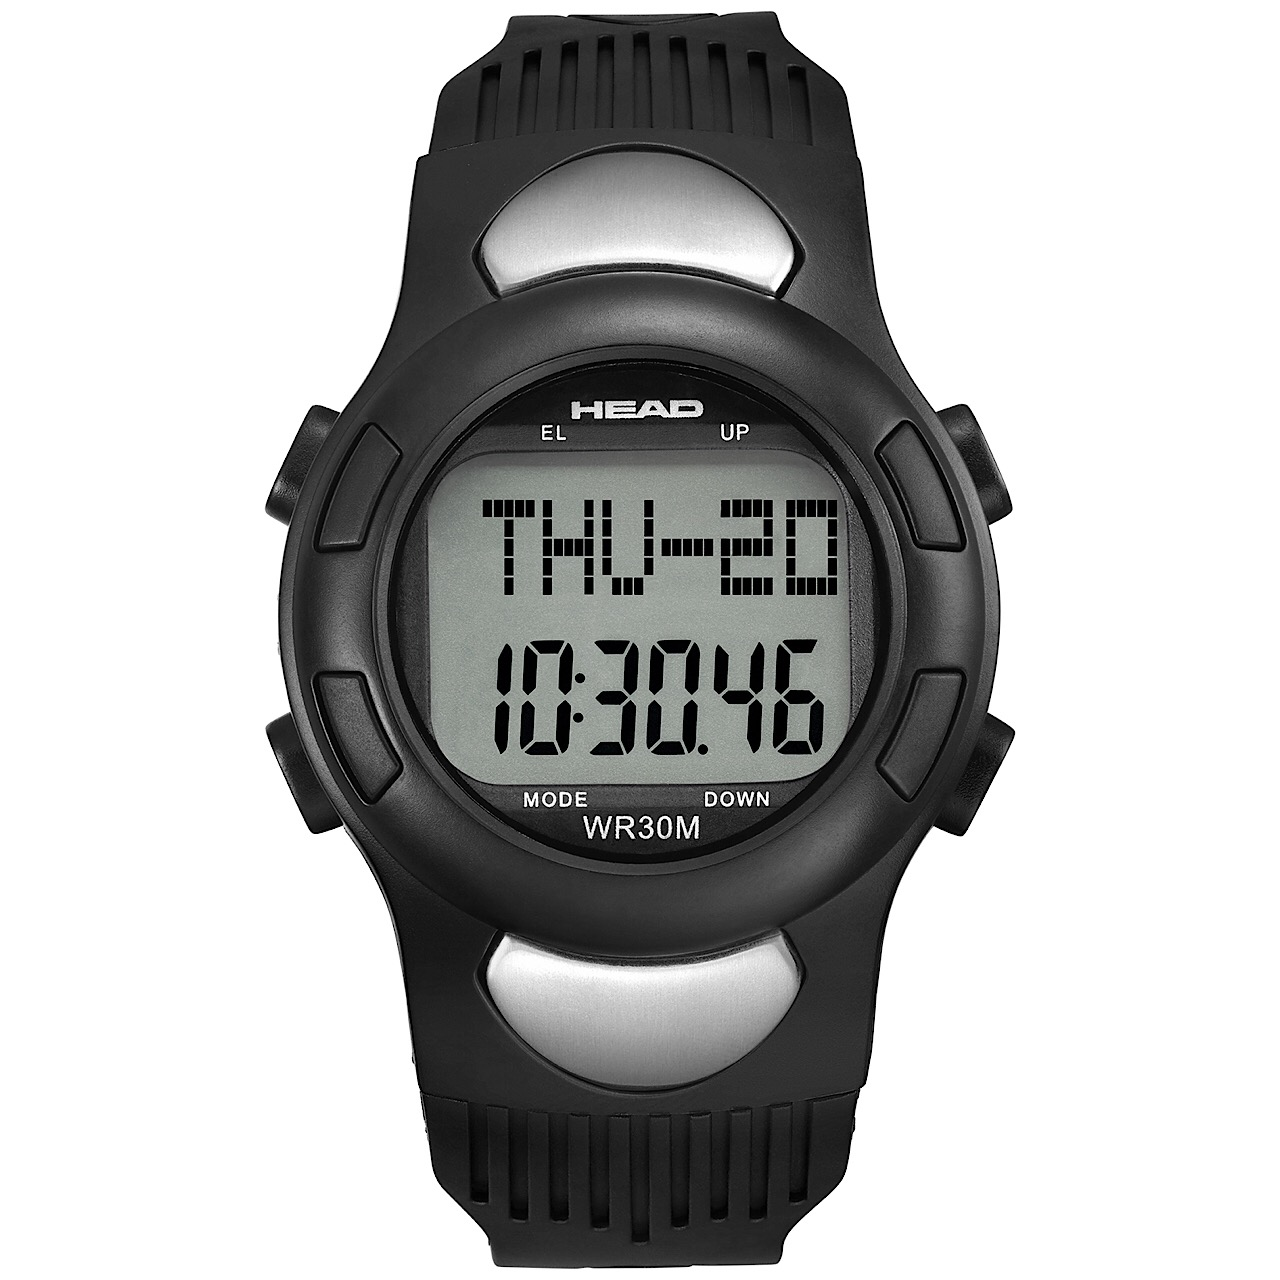 ساعت مچی دیجیتالی هد مدل Tie Break HE-101-01 55